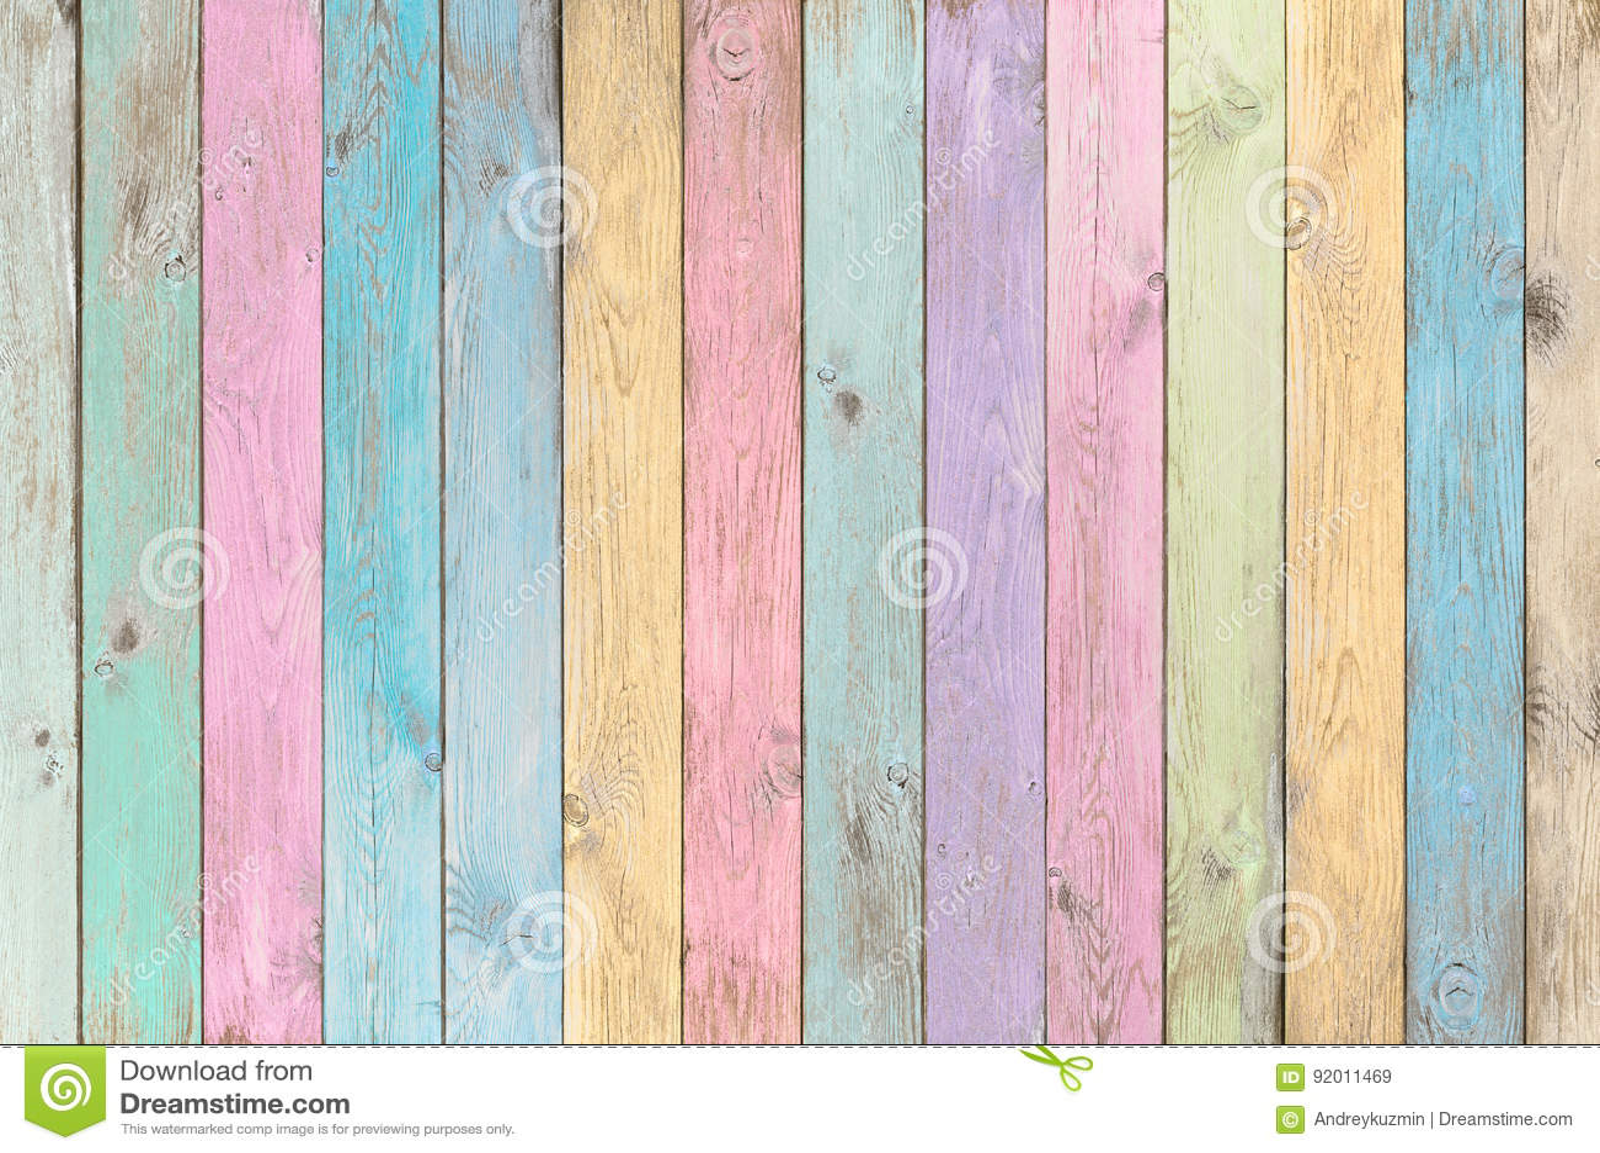 Fondos De Pantalla Rosas Tablones De Madera Rosa Color: Tablones De Madera En Colores Pastel Coloridos Textura O